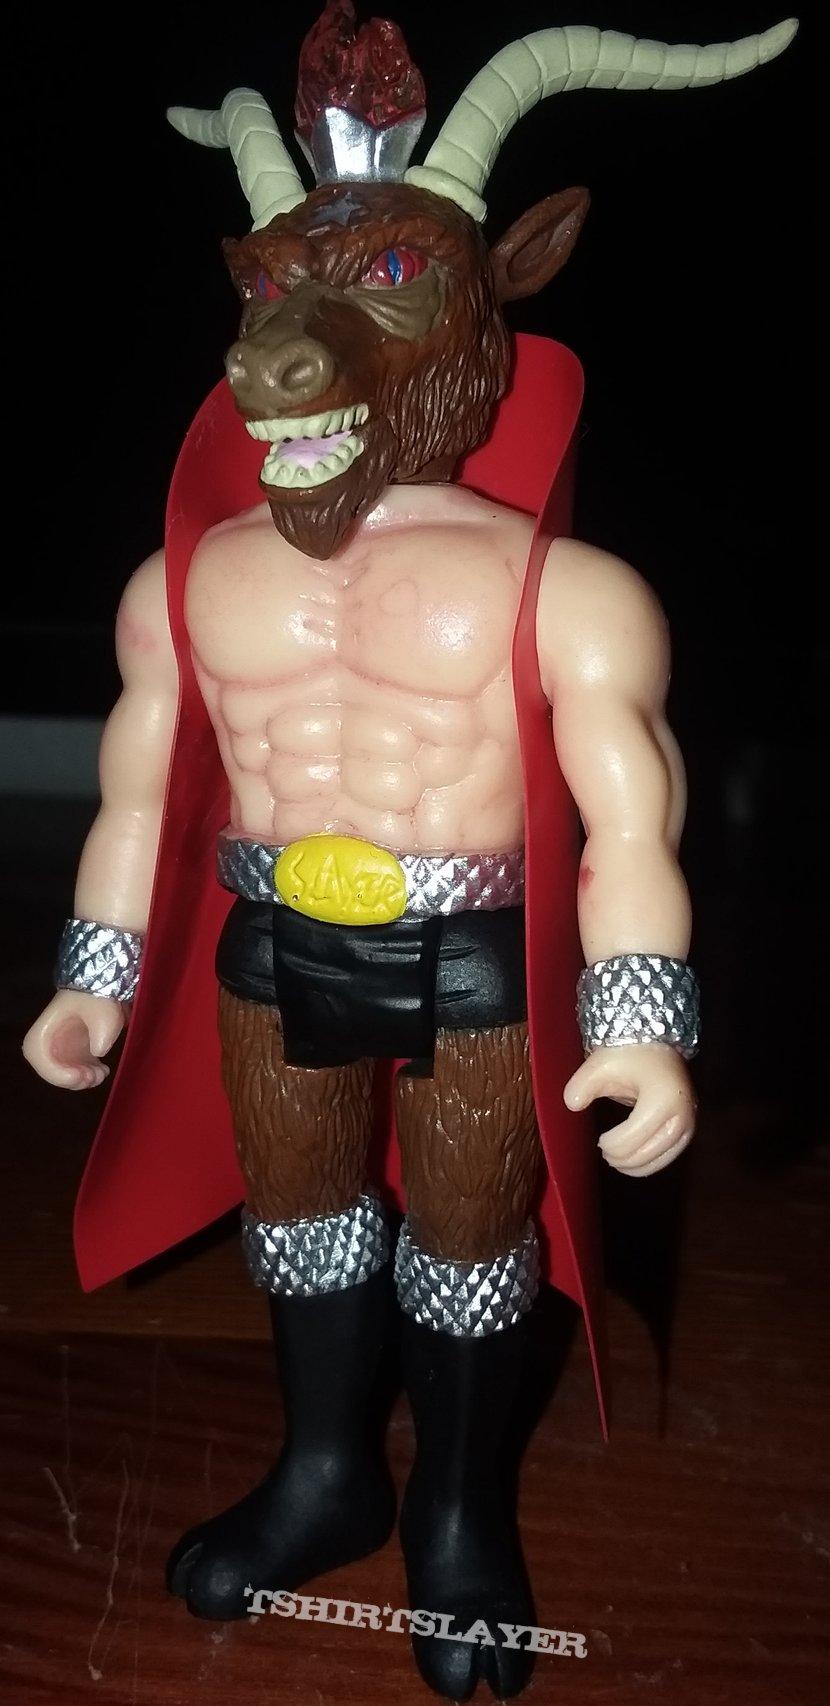 Slayer - Show No Mercy action figure